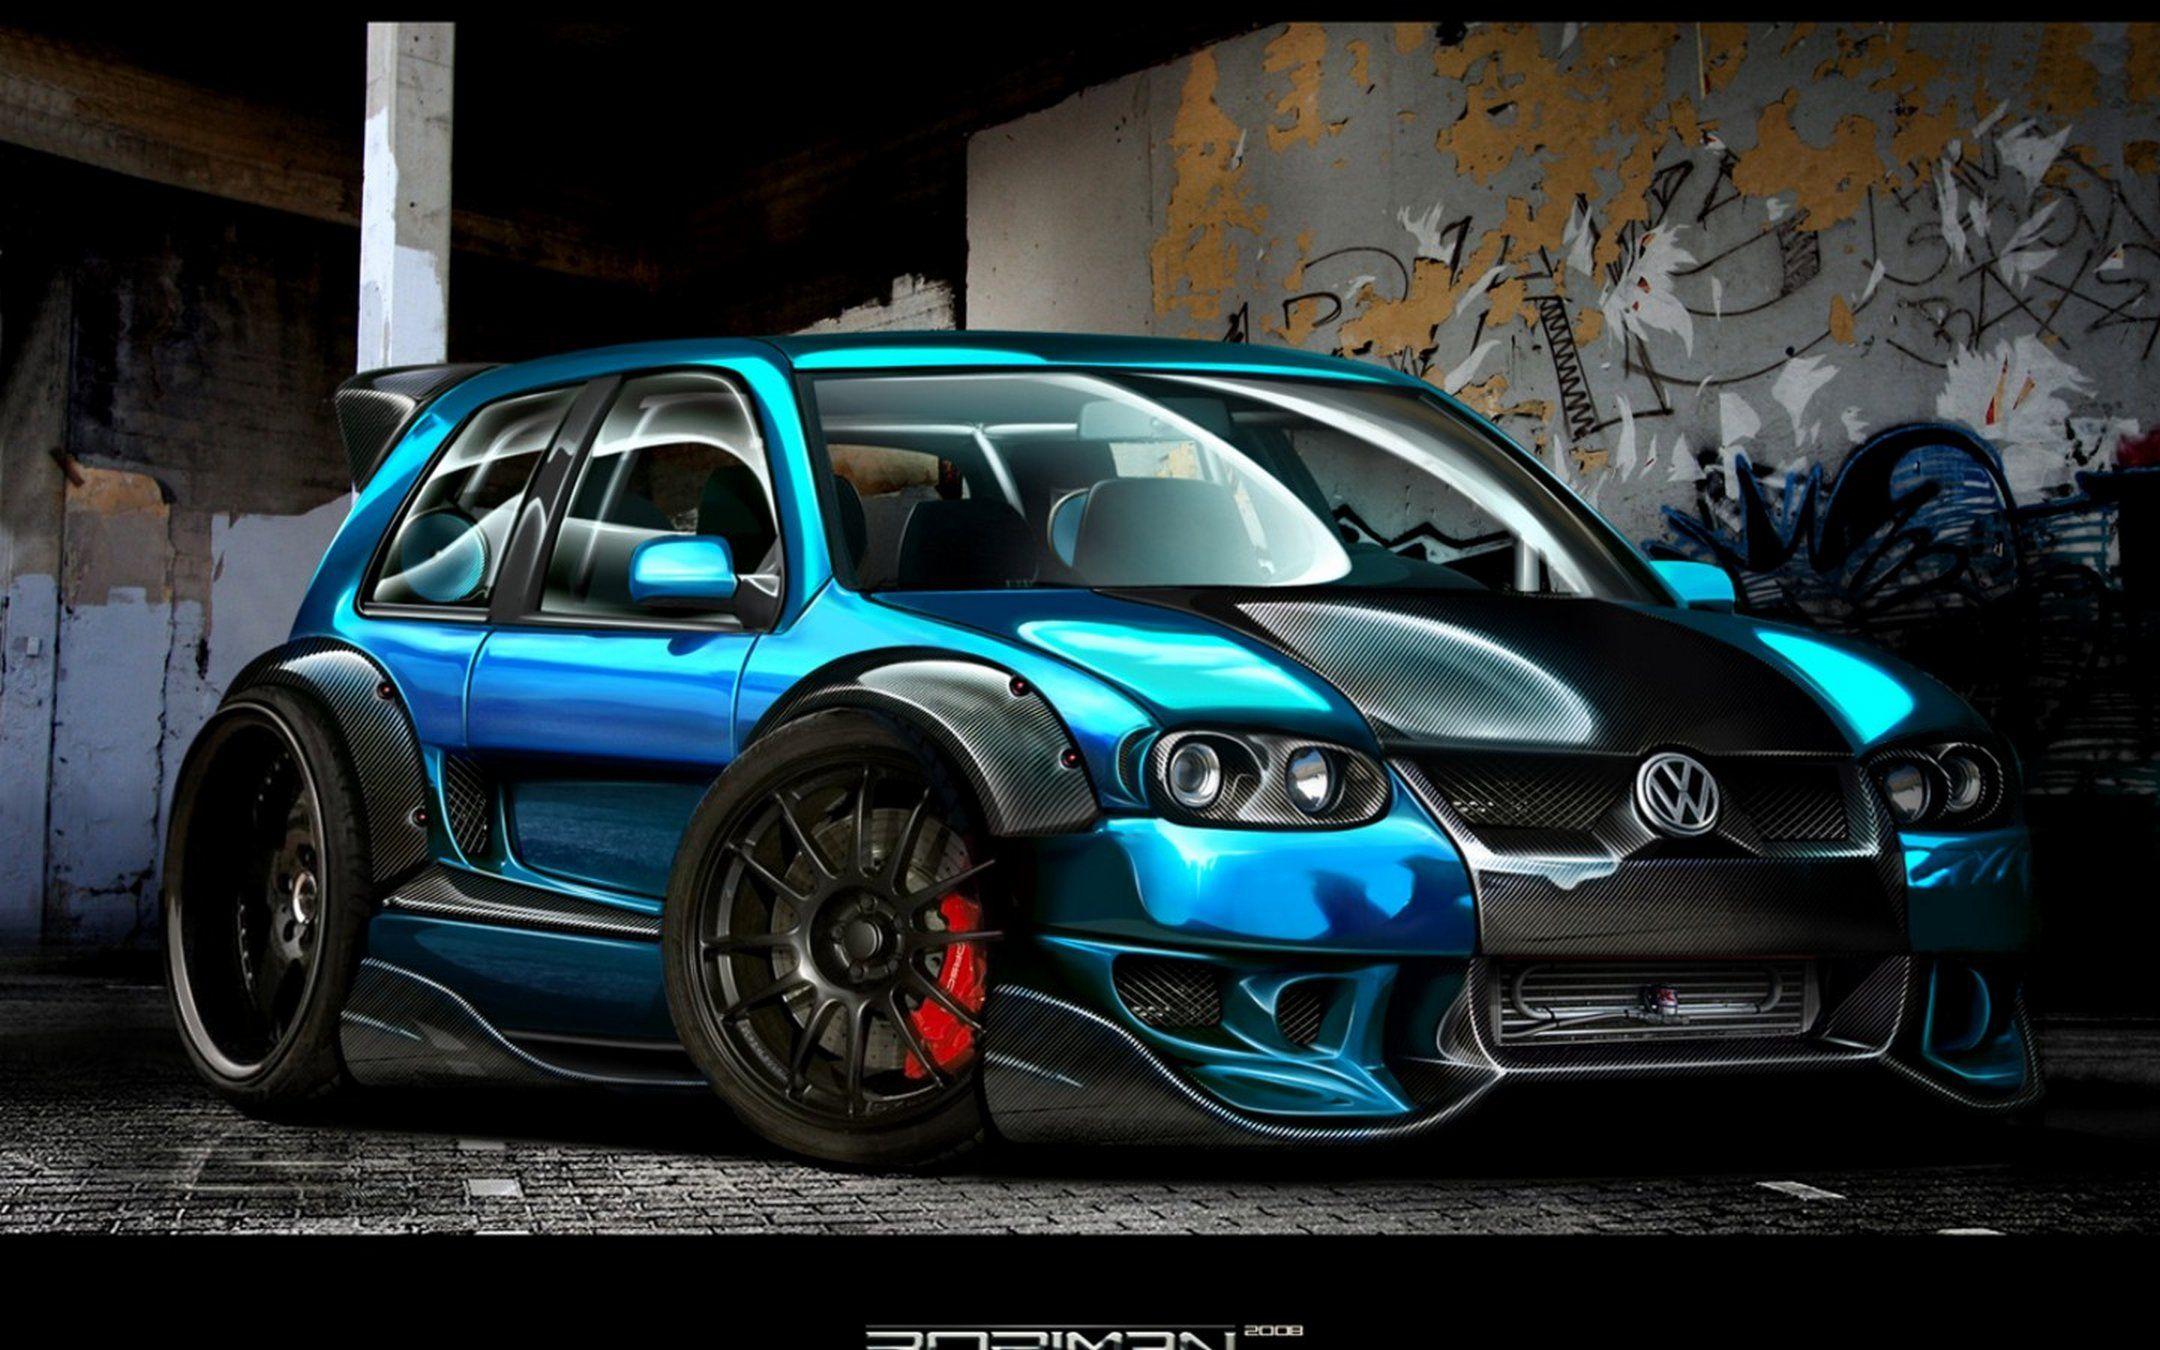 Wallpaper Desktop 3d Car High Quality Cool Car Pictures Sports Car Wallpaper Cool Wallpapers Cars